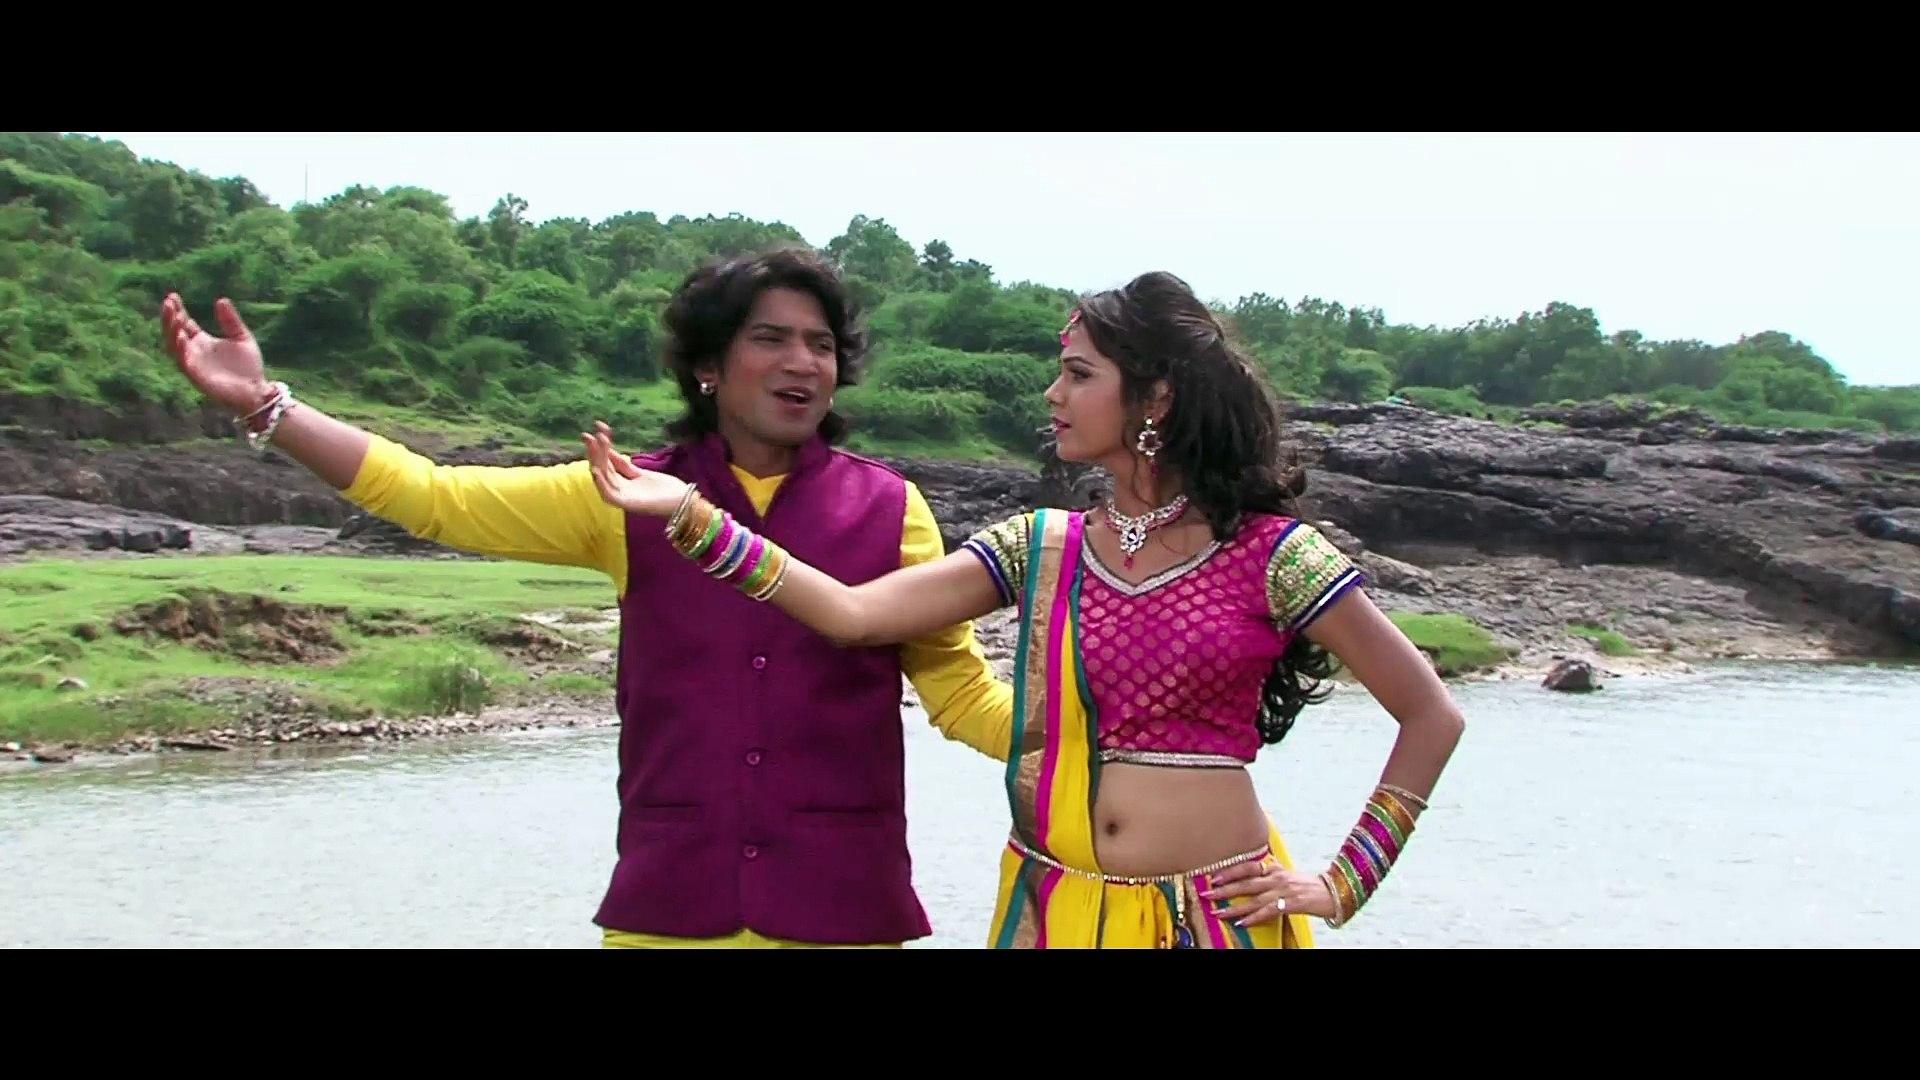 Kon Halave Limdi Kon Jhulave Pipli Film Song | Dharti Dole Ambar Dole | Vikram Thakor,Mamta Soni